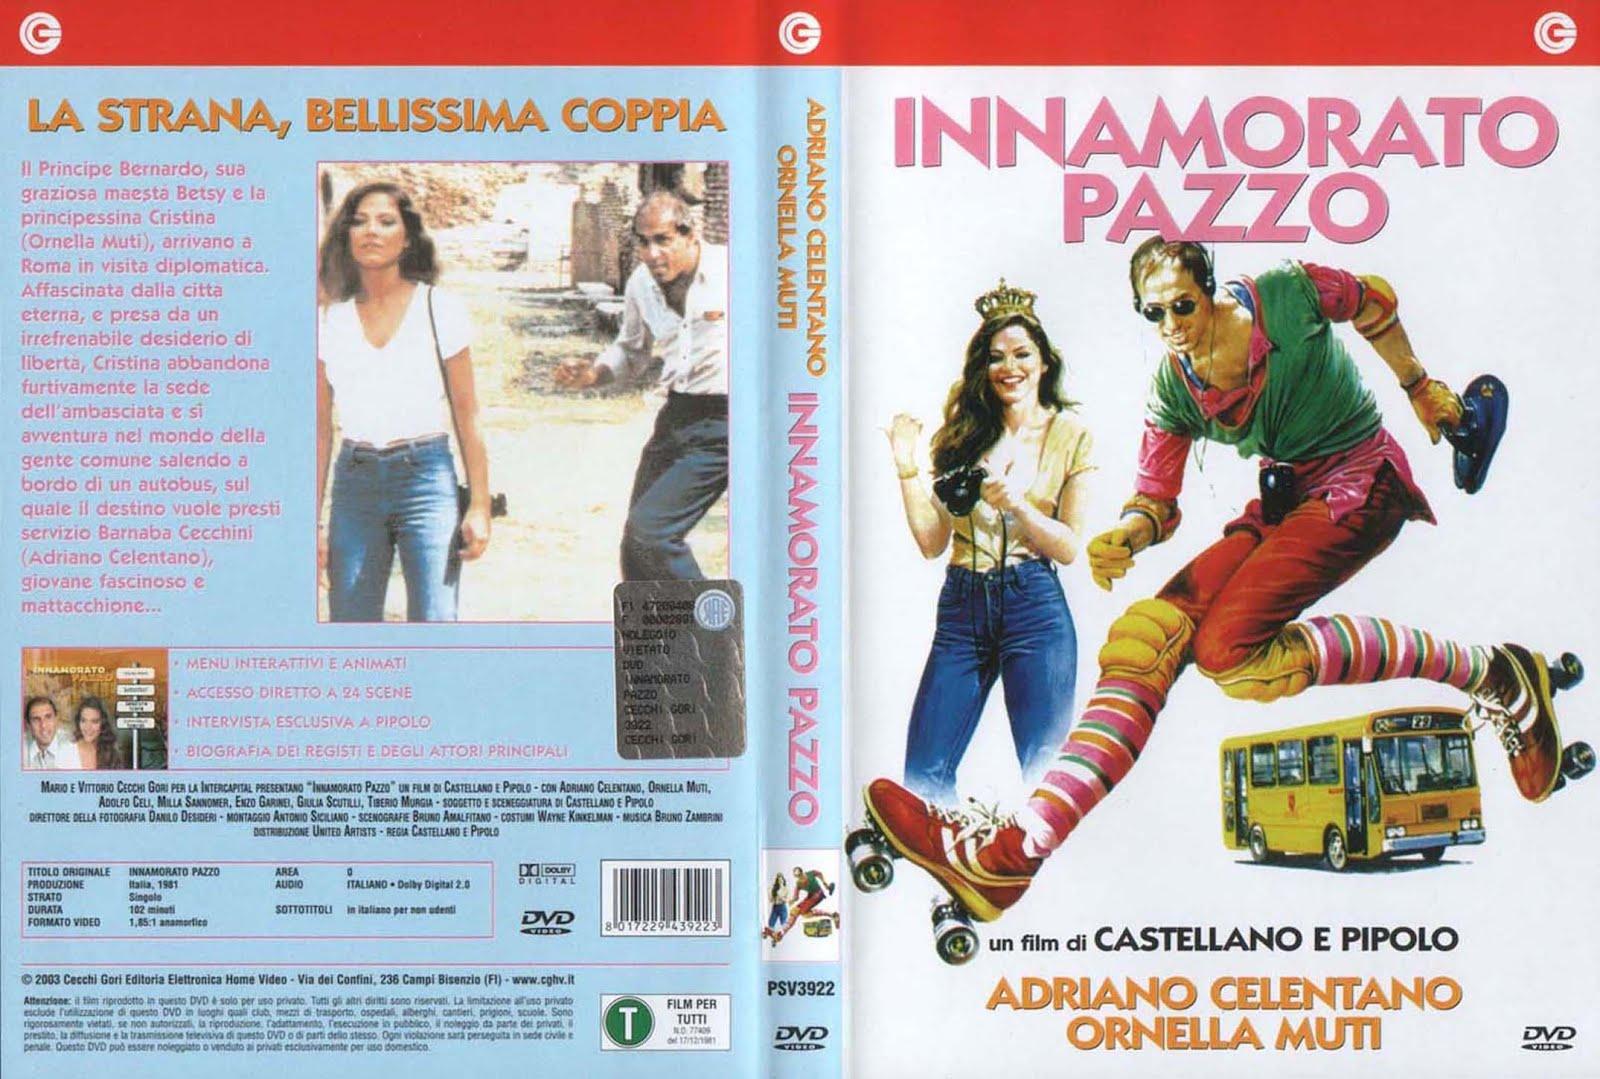 http://2.bp.blogspot.com/-_vAK6Gz5nkk/Ty3BZ2JHc1I/AAAAAAAAIsg/VmsQj46r95I/s1600/Innamorato_pazzo.jpg